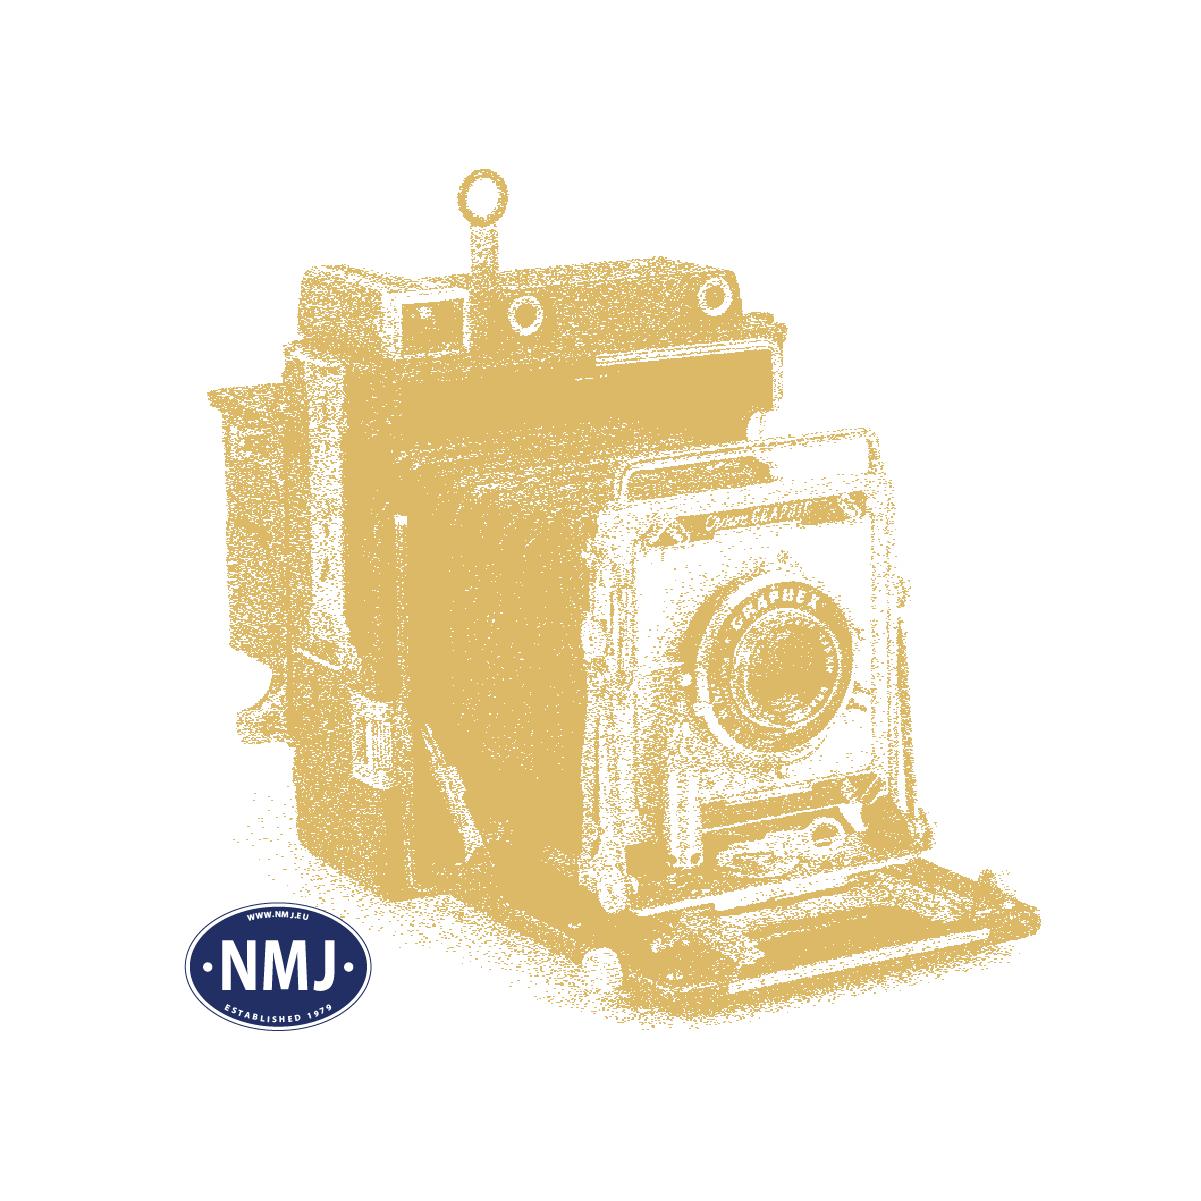 NMJT108.101 - NMJ Topline NSB BF11.21524, Rotbraun